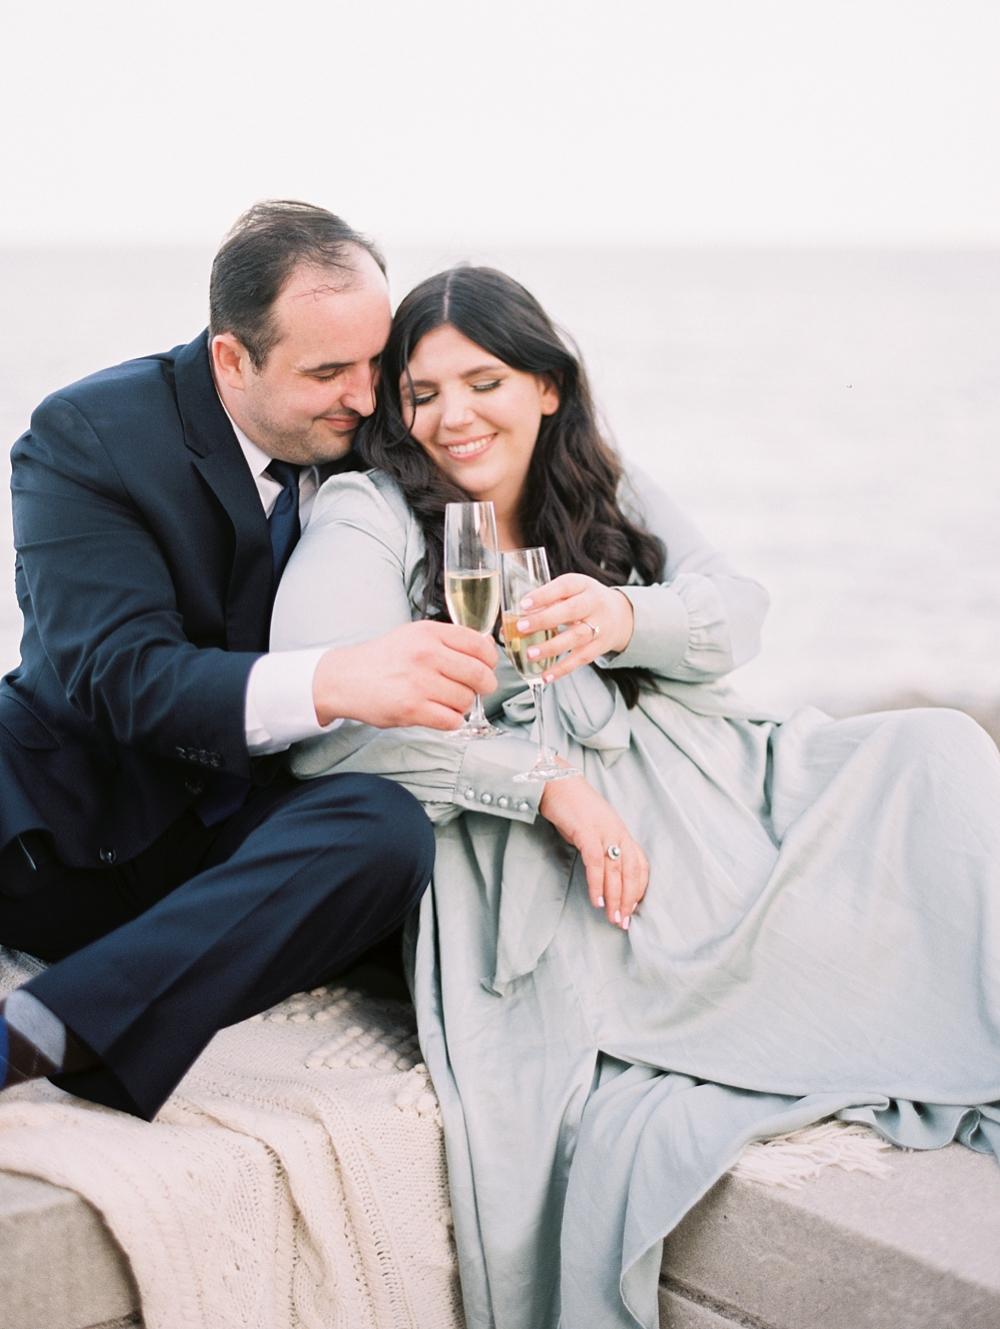 kristin-la-voie-photography-chicago-wedding-photographer-loyola-engagement-15